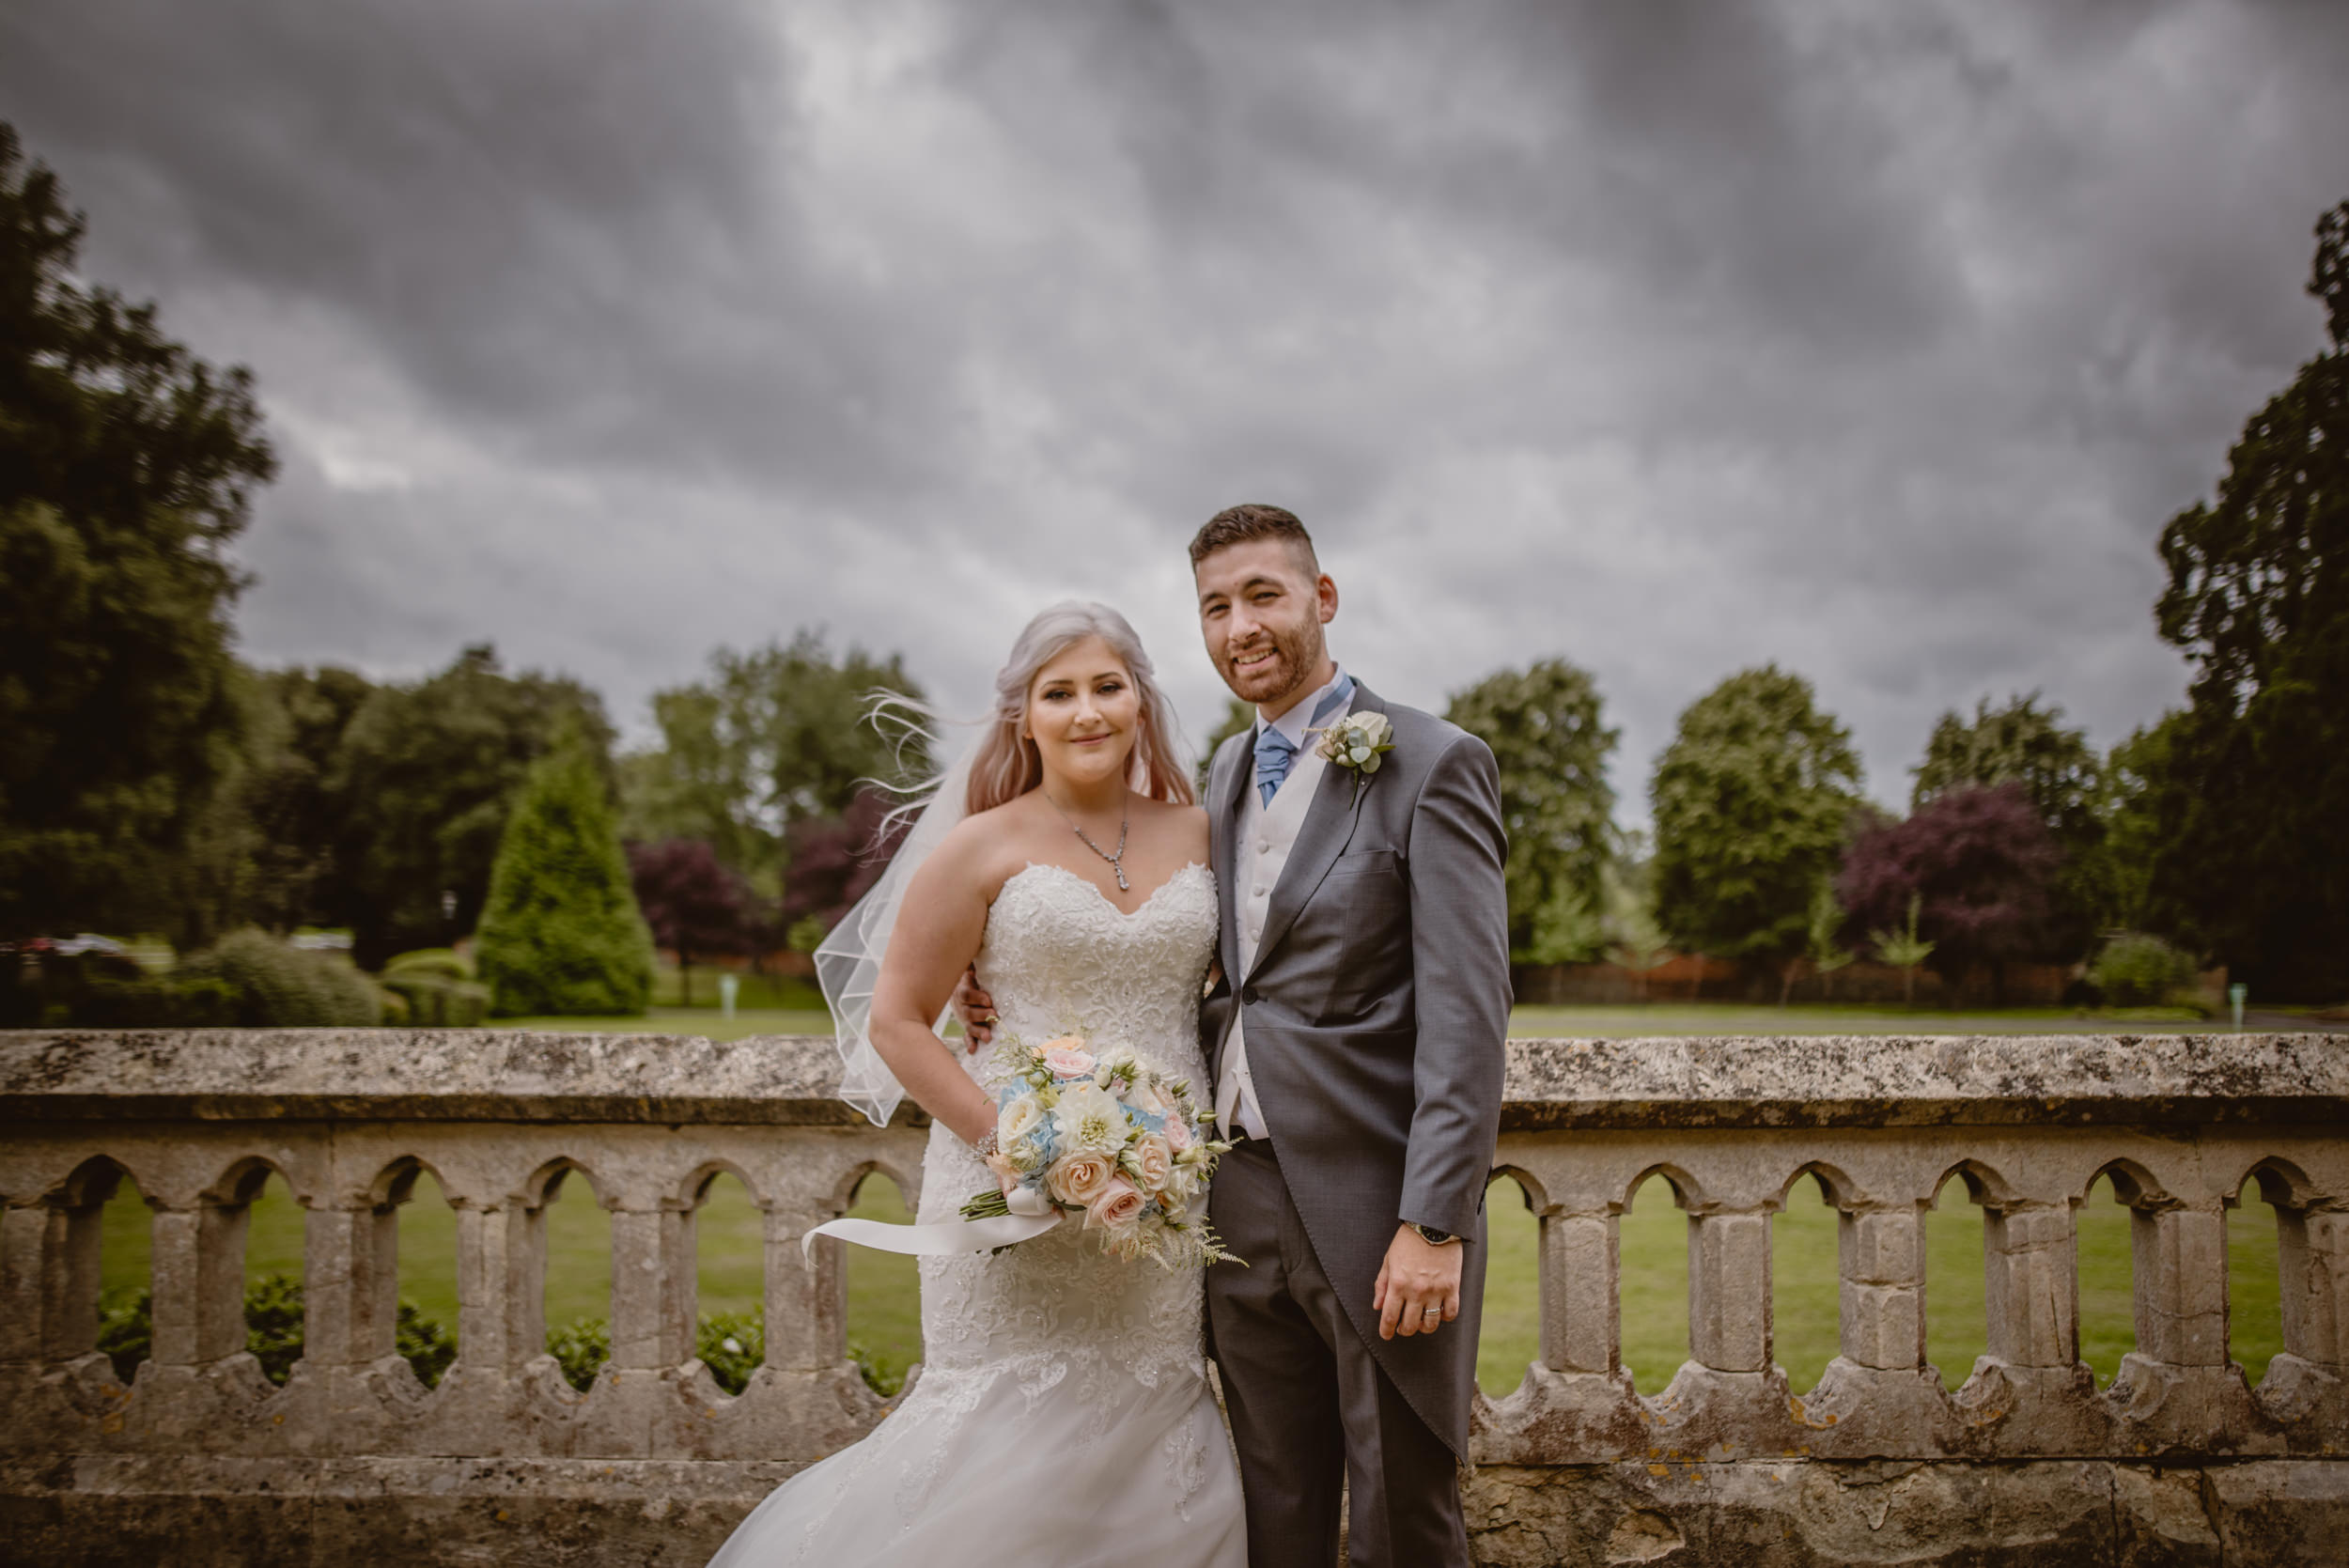 Rachel-and-James-Wedding-Horsley-Towers-State-Manu-Mendoza-Wedding-Photography-310.jpg